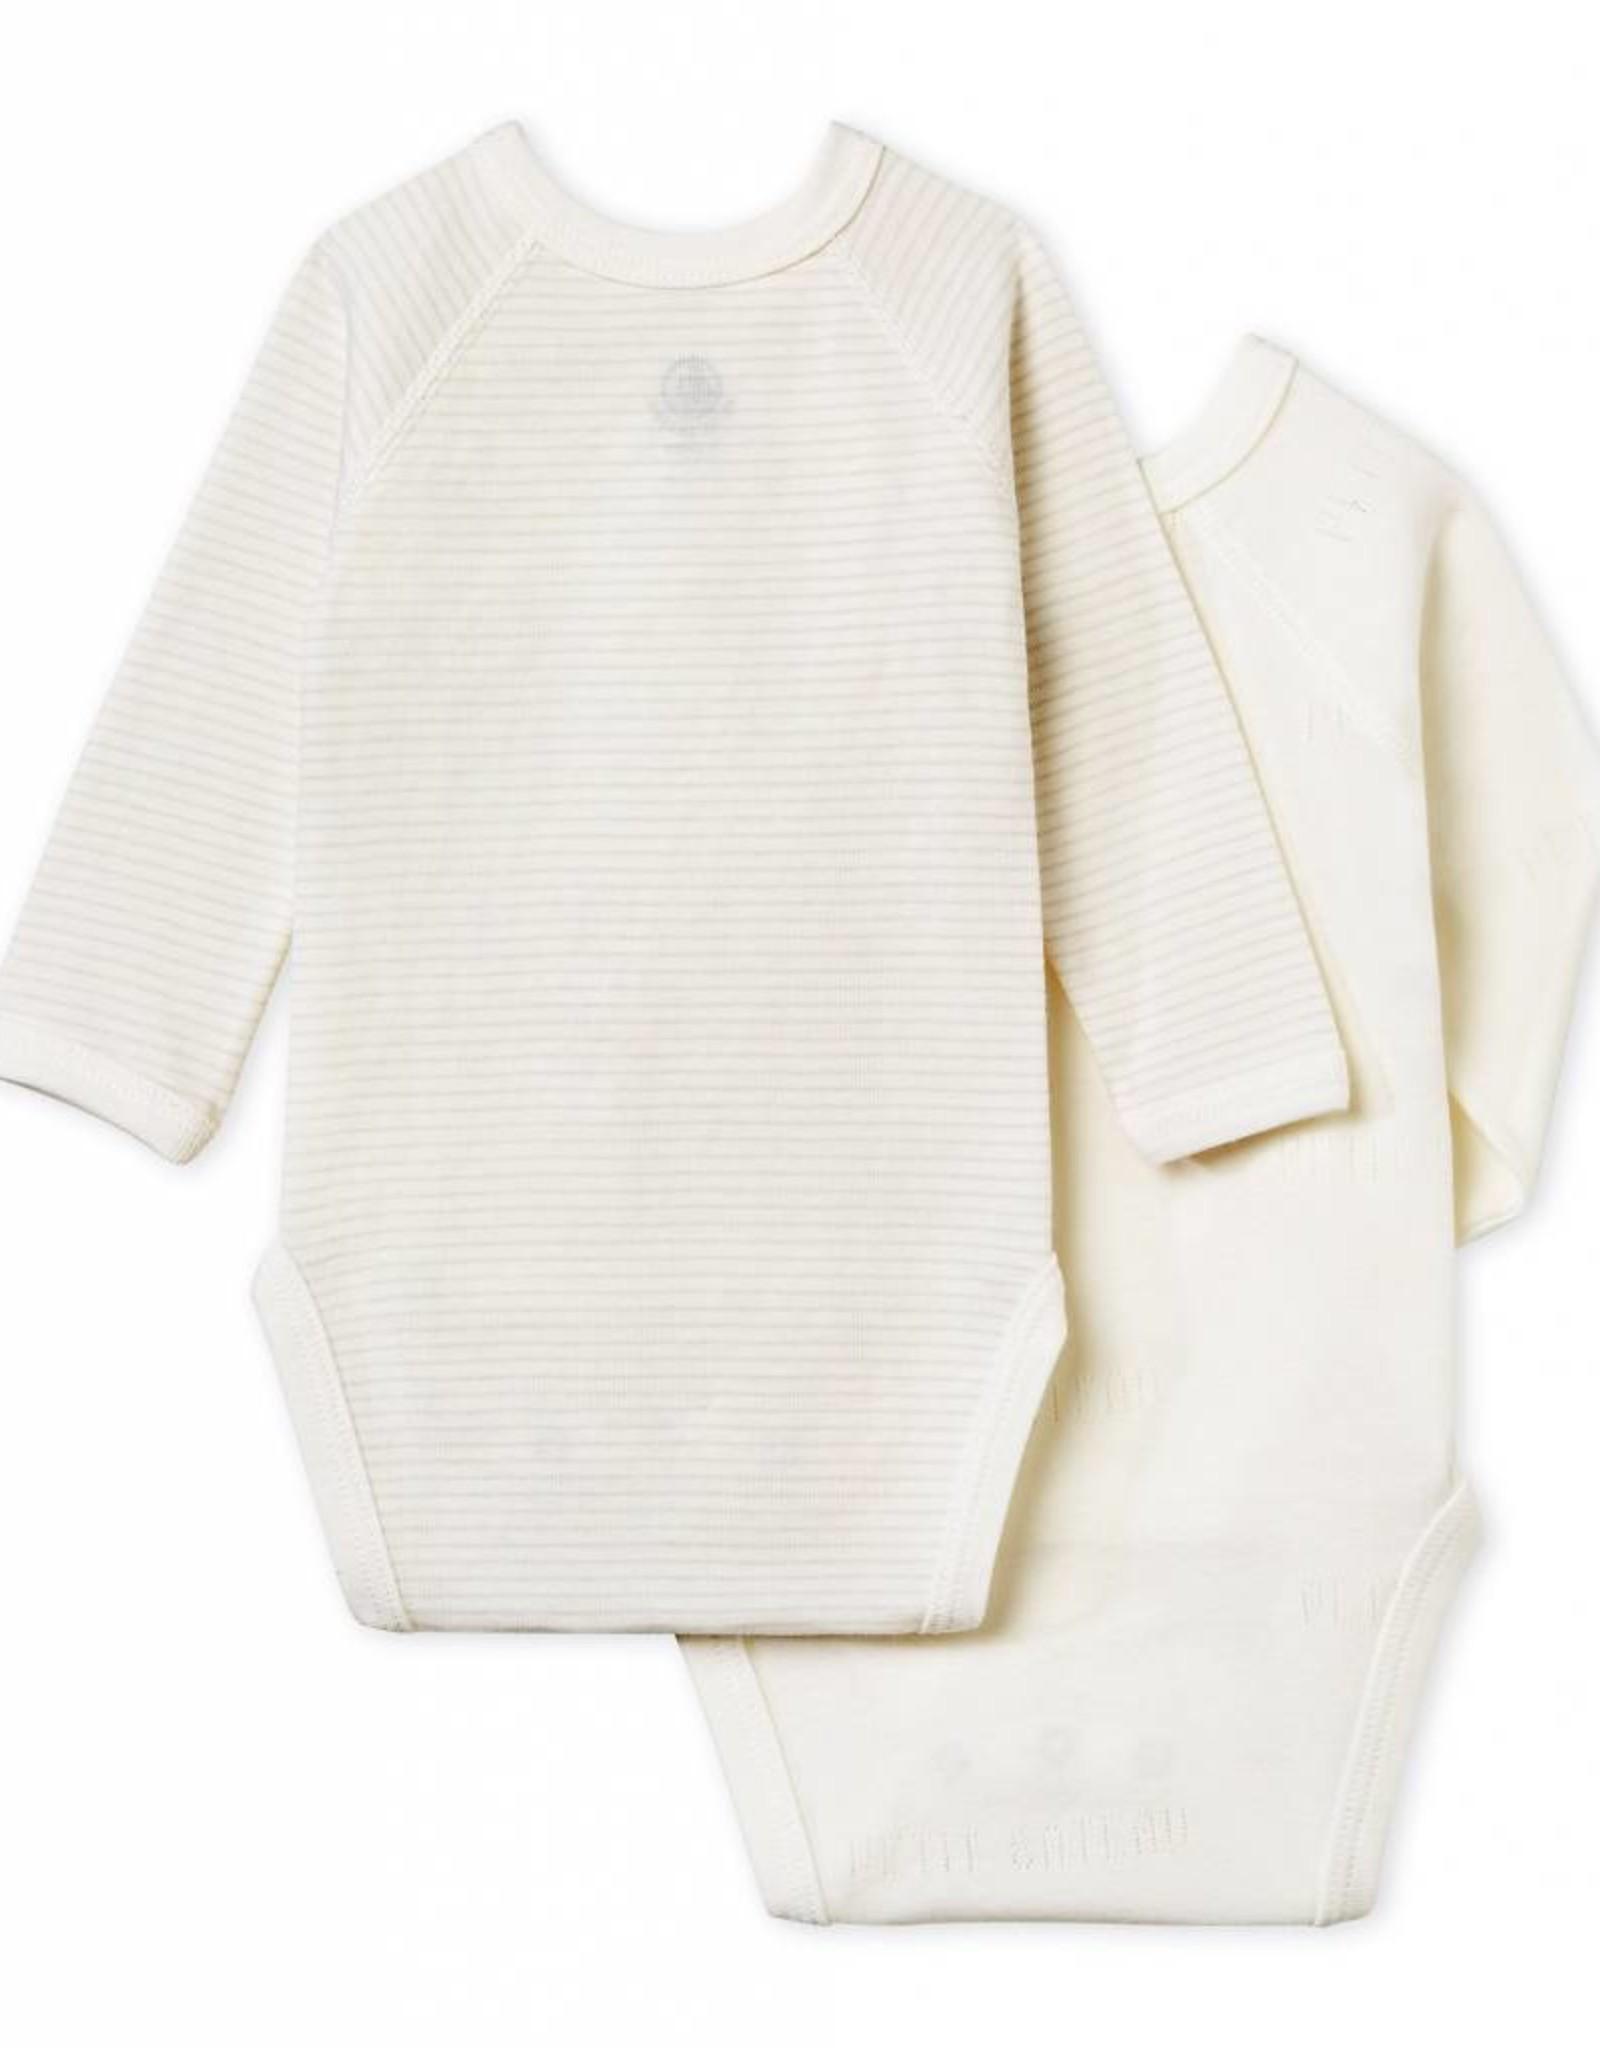 Set of 2 baby bodysuits